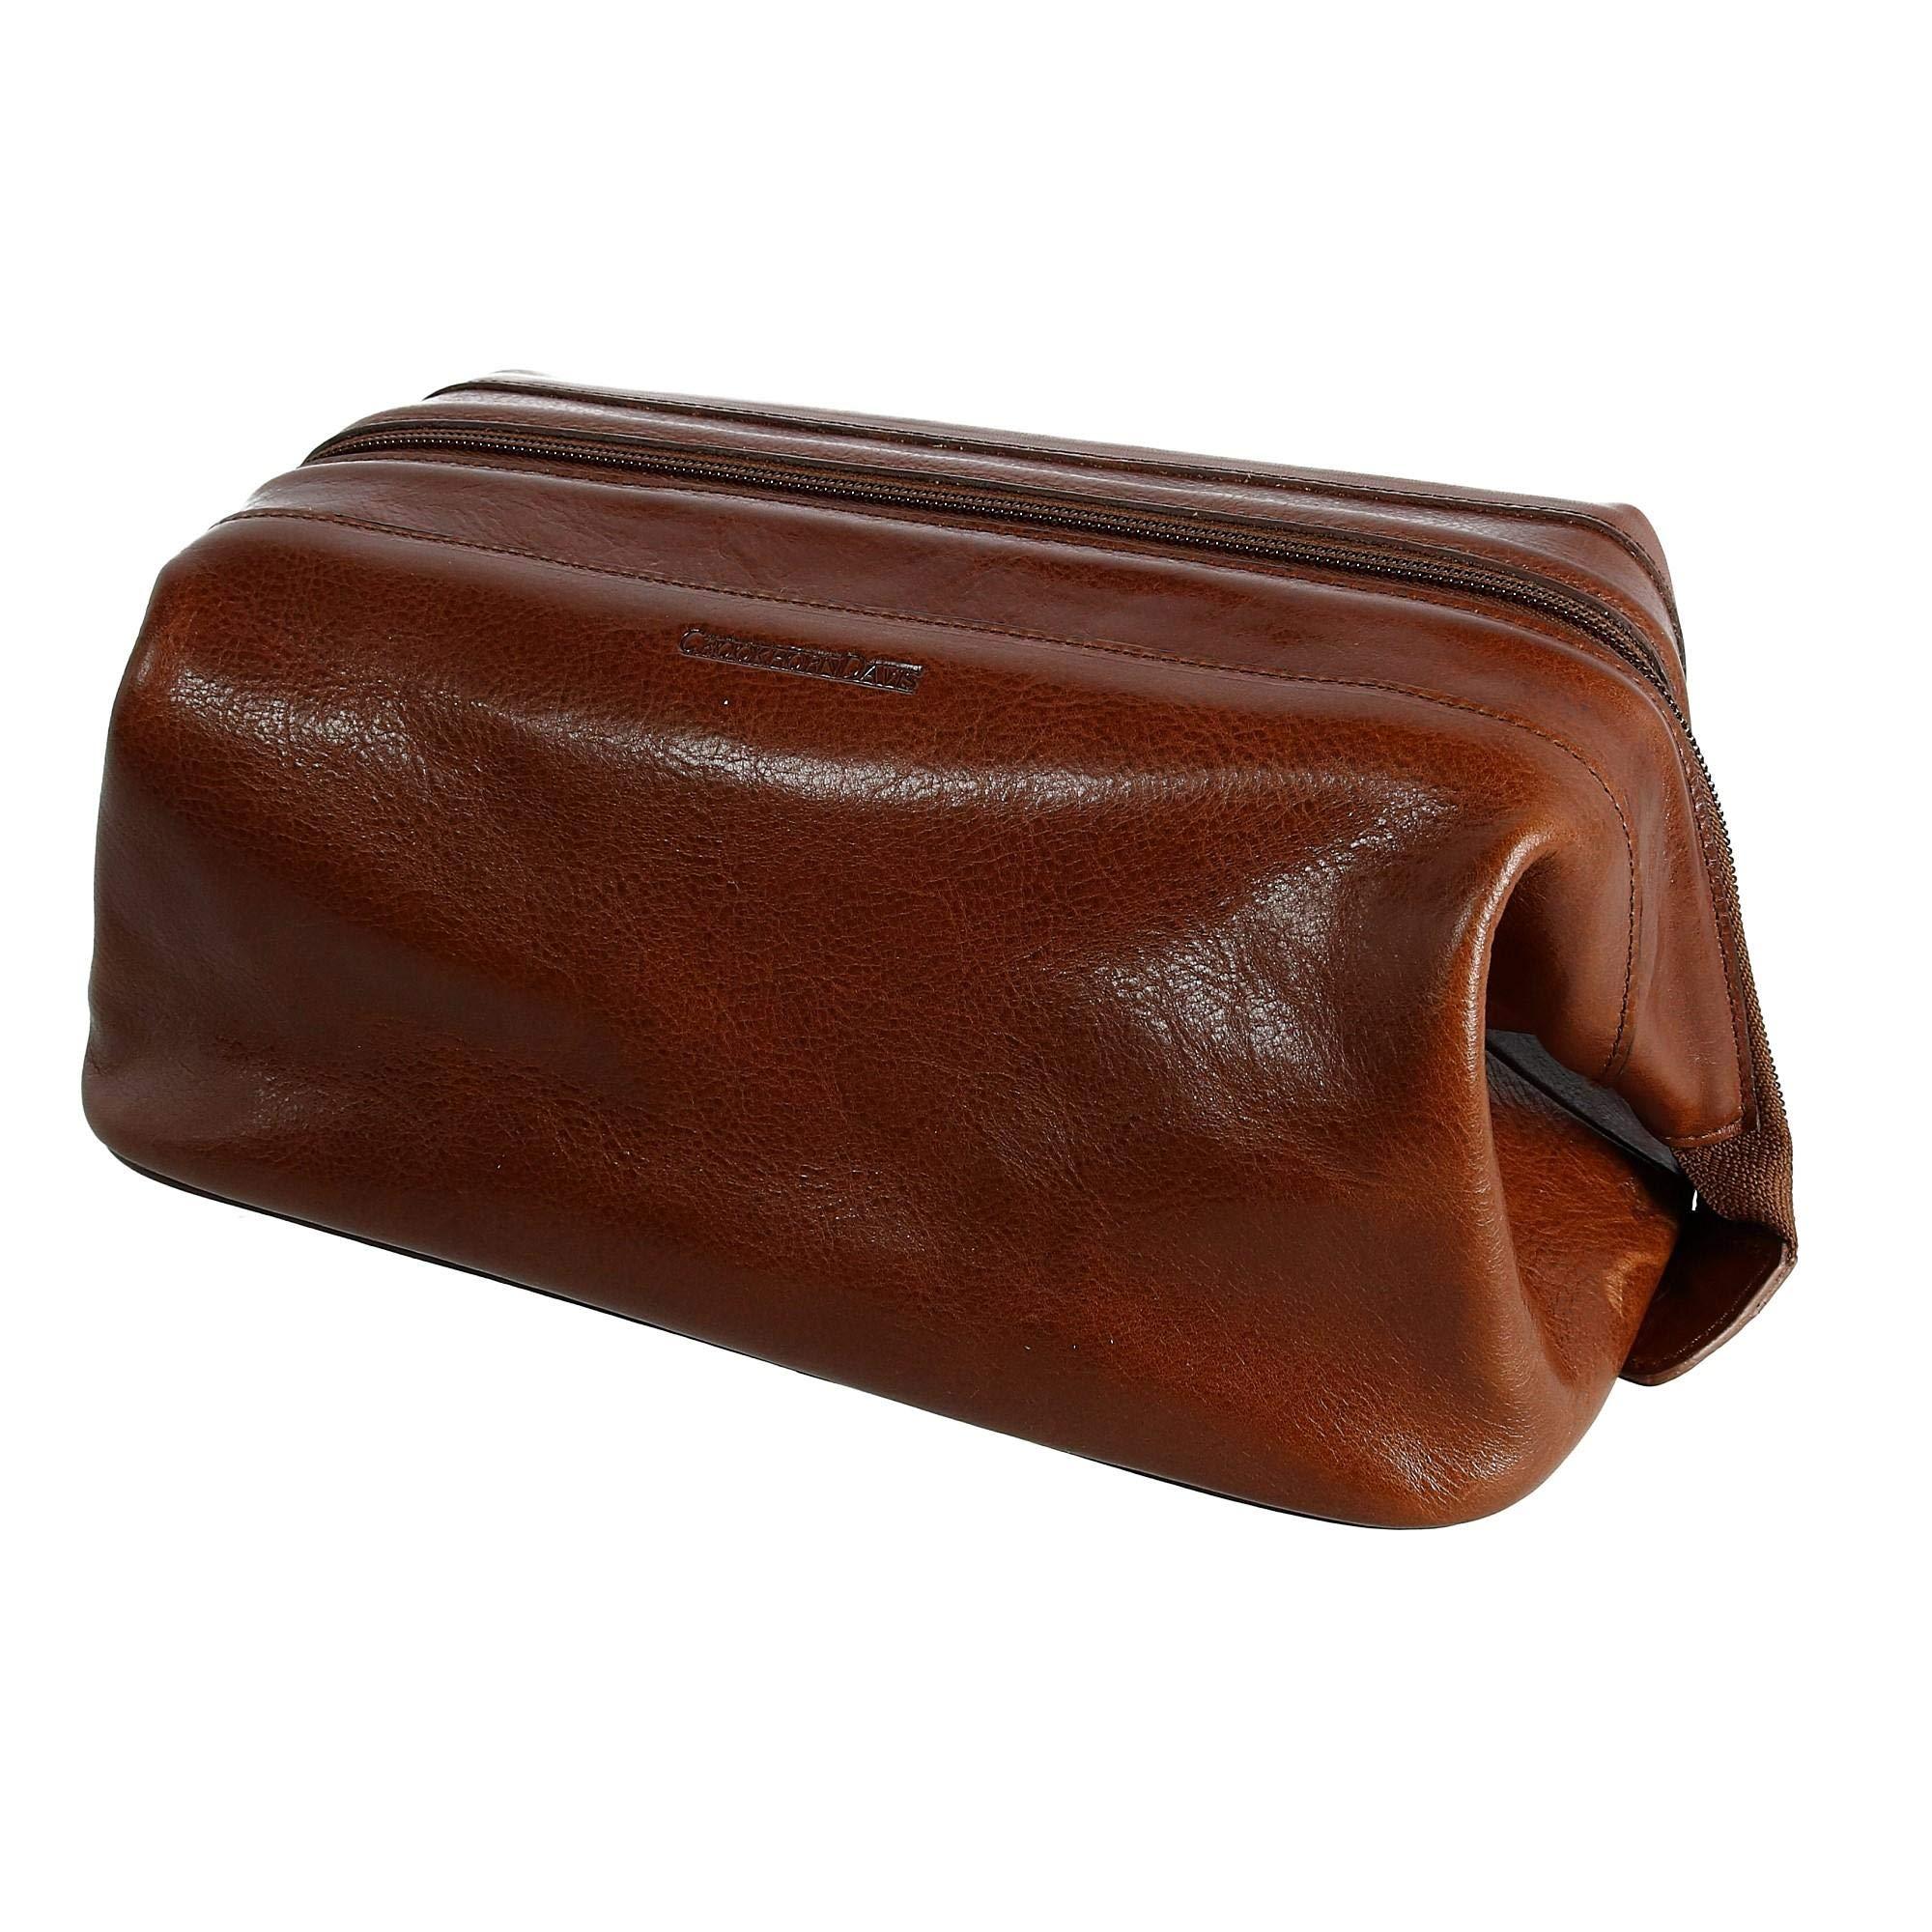 CrookhornDavis Men's Toiletry Bag, Travel Zipper Pouch, Leather Dopp Kit, Brown